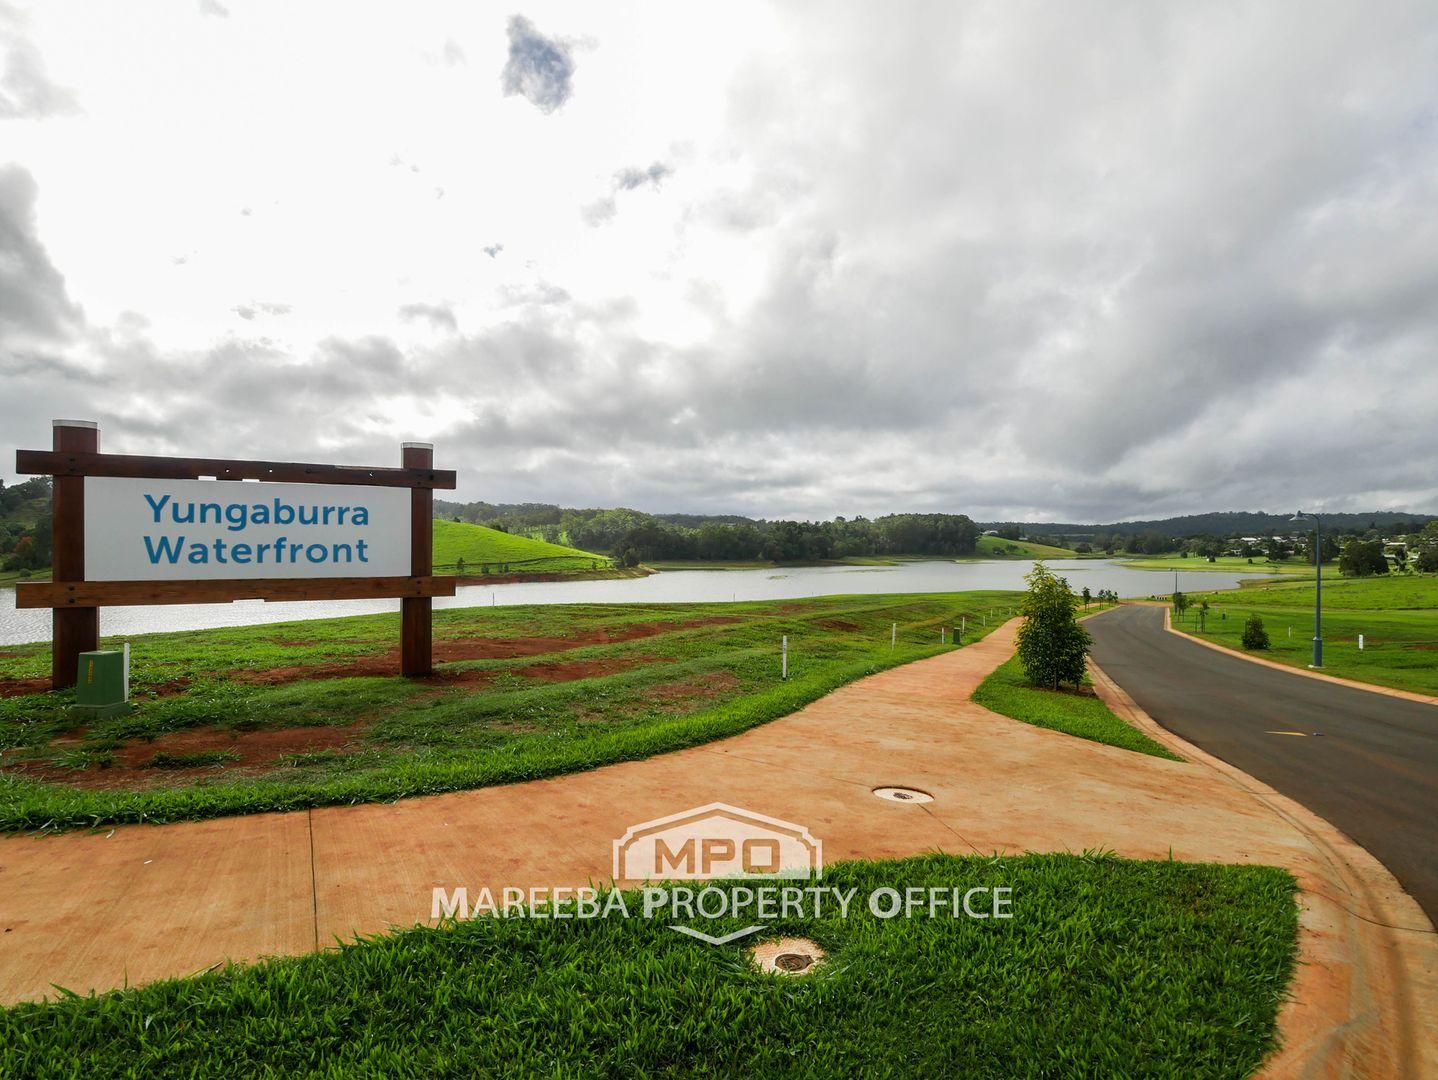 2-5 7-8 59-63 Waterfront Terrace, Yungaburra Waterfront, Yungaburra QLD 4884, Image 0